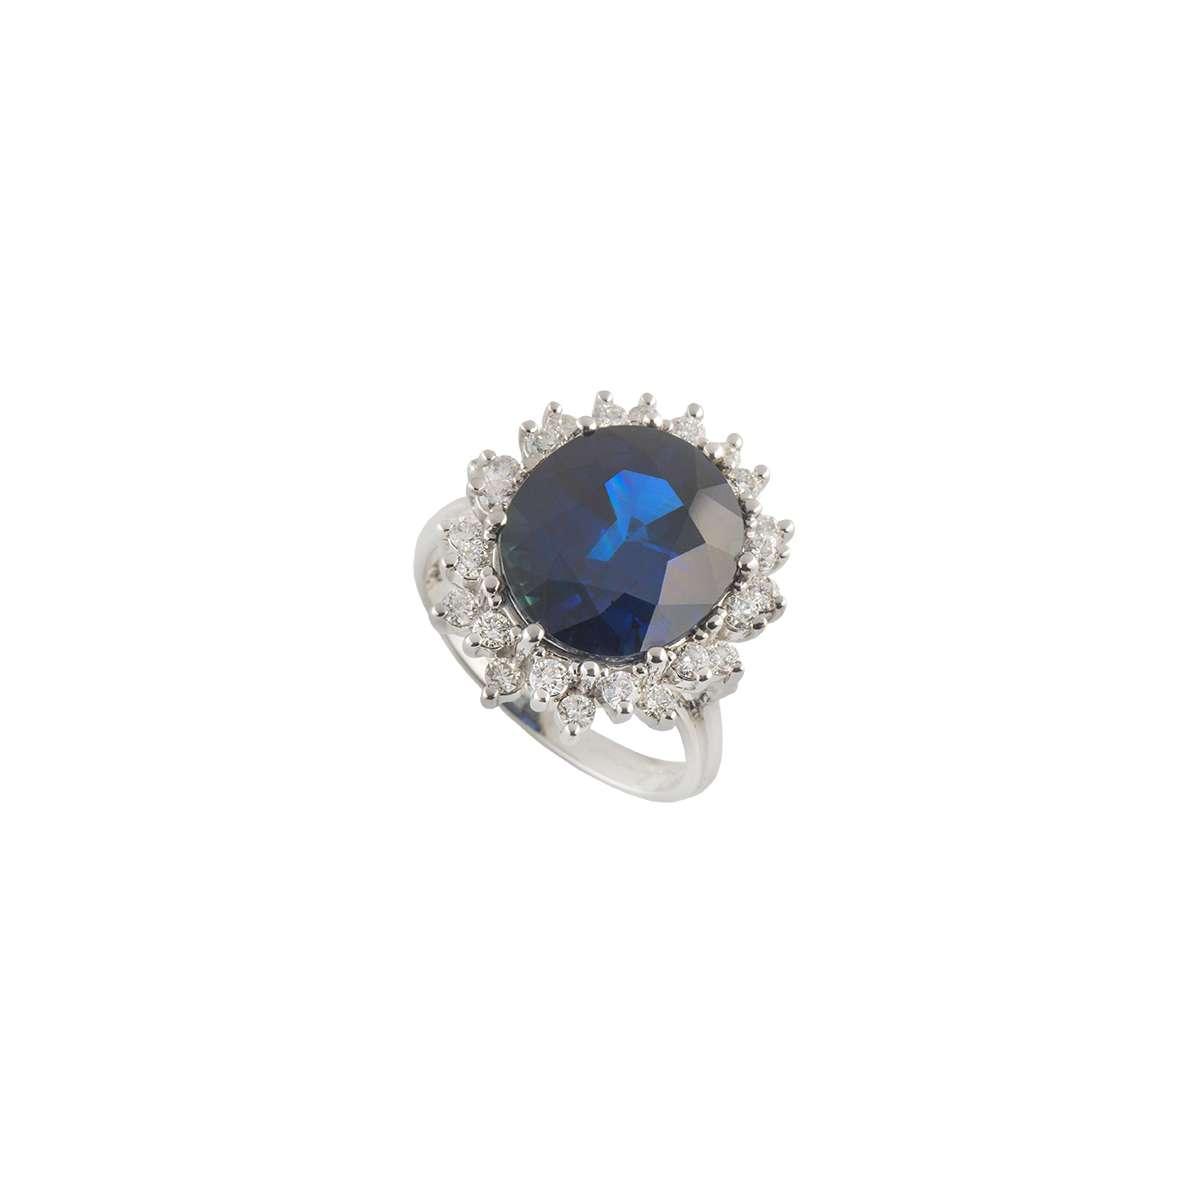 14k White Gold Diamond and Sapphire Ring 0.80ct H/VS